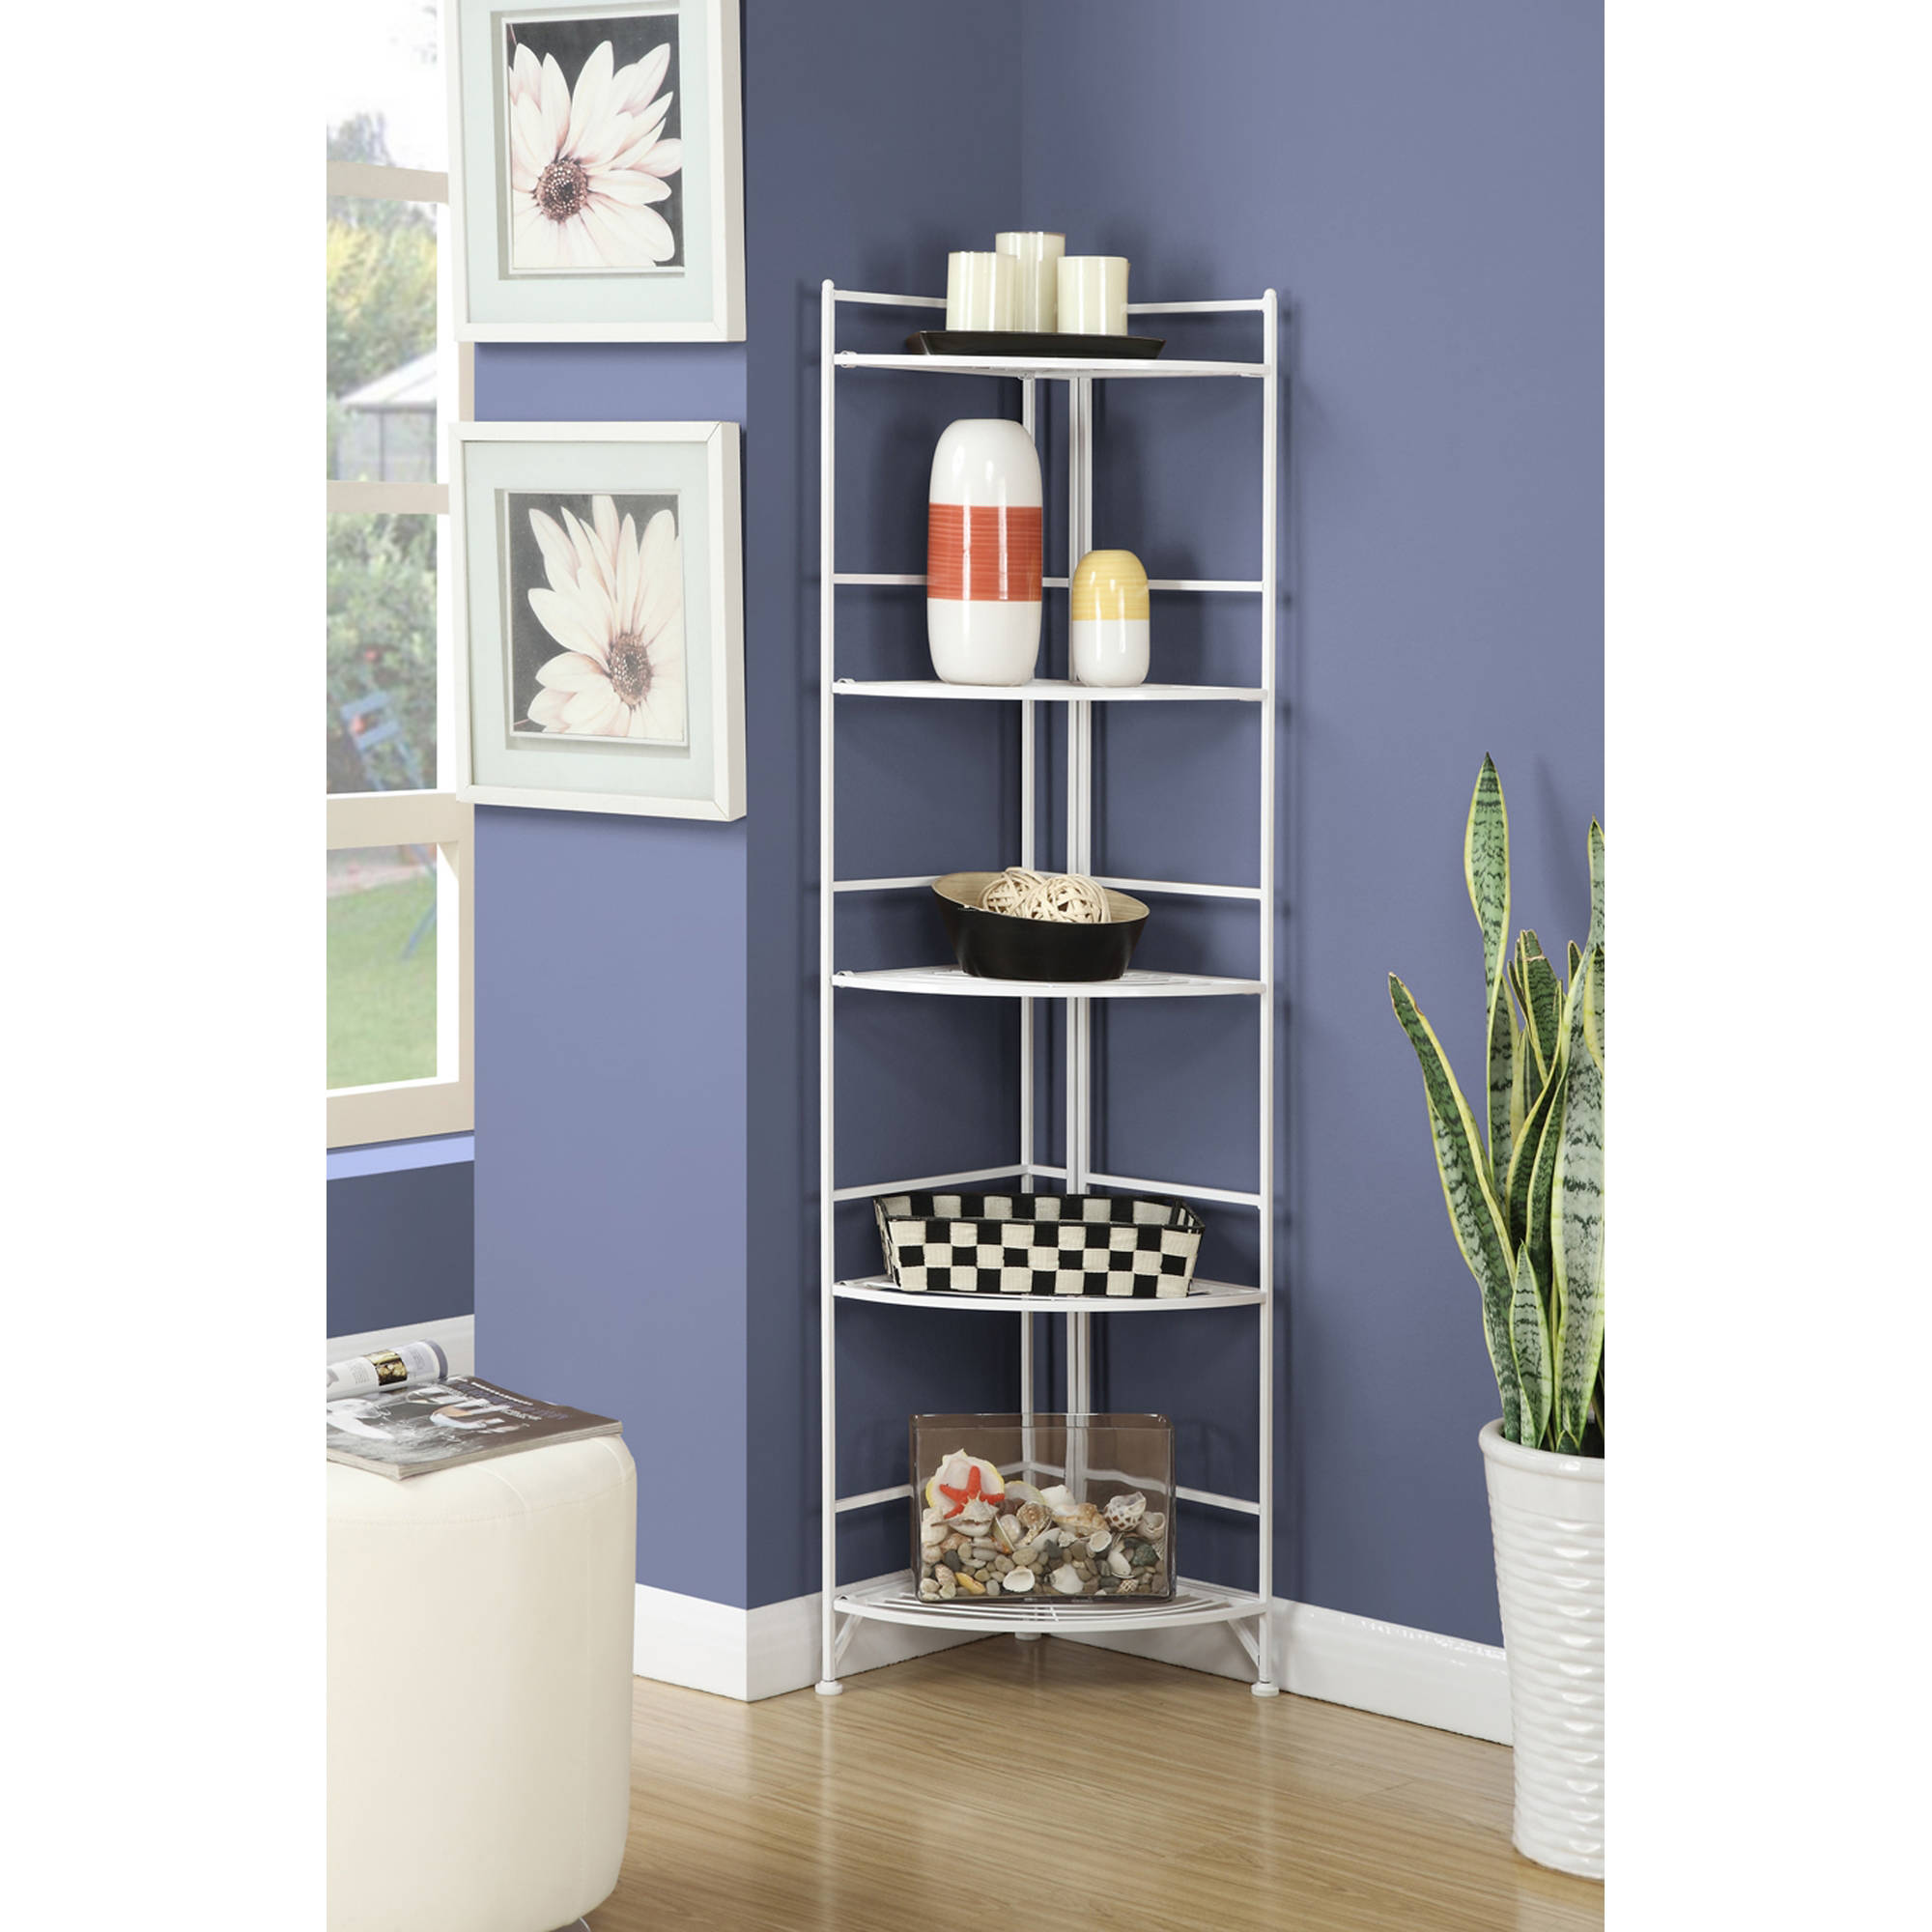 Designs2Go 5 Tier Folding Metal Corner Shelf